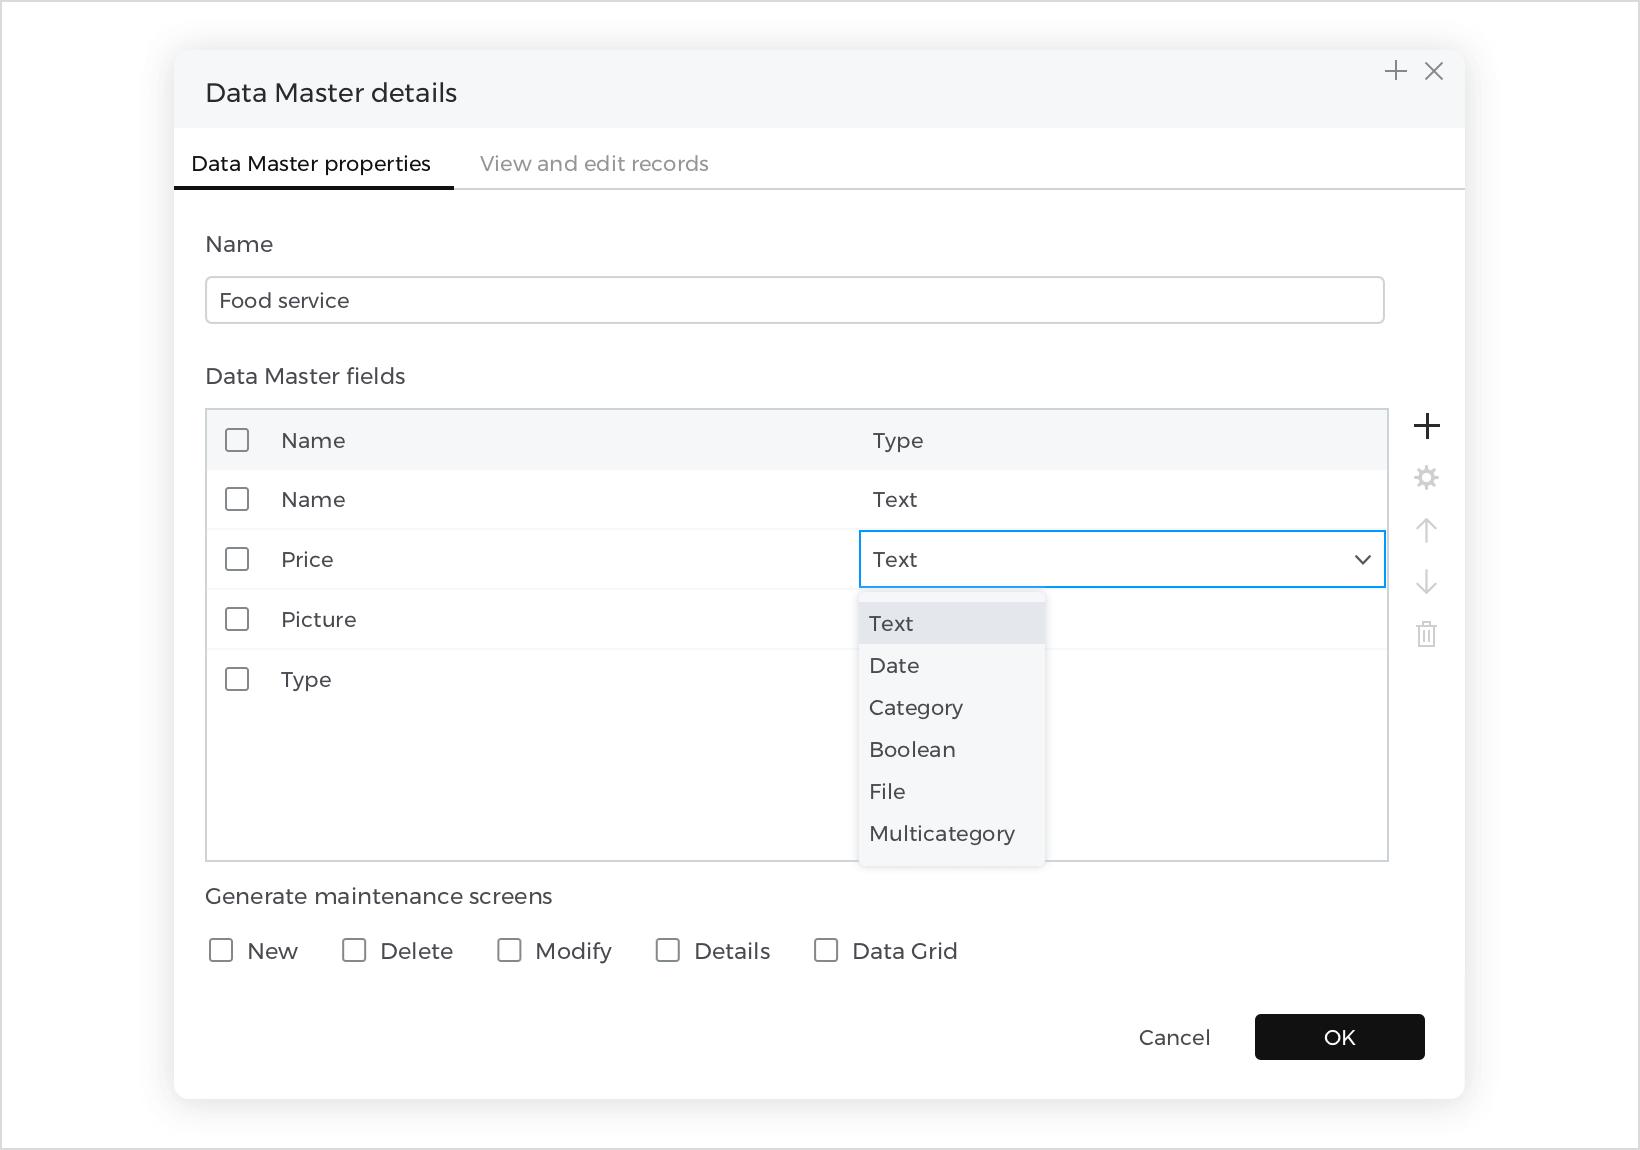 Data Master field types